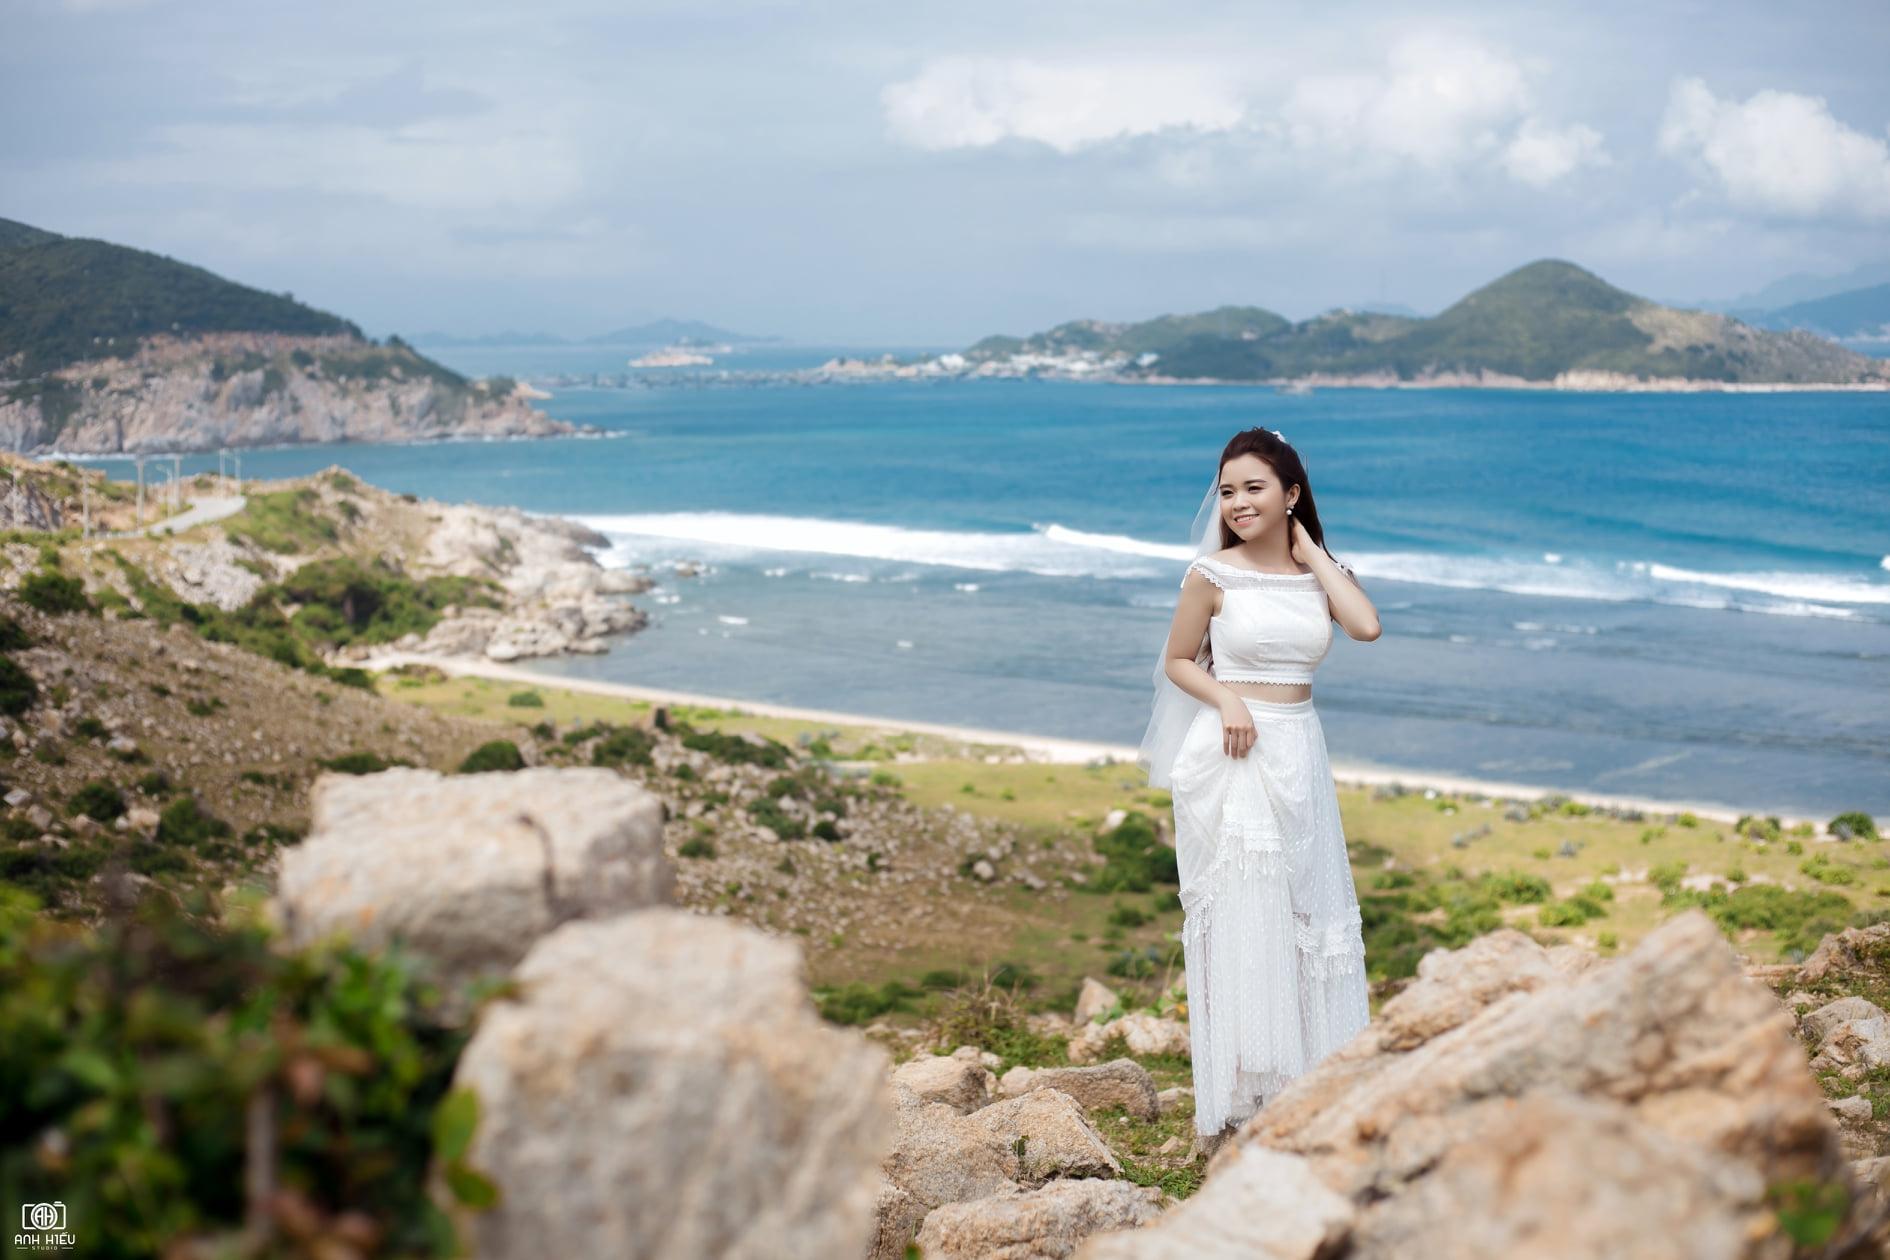 Hinh Cuoi Vinh Hy (23)